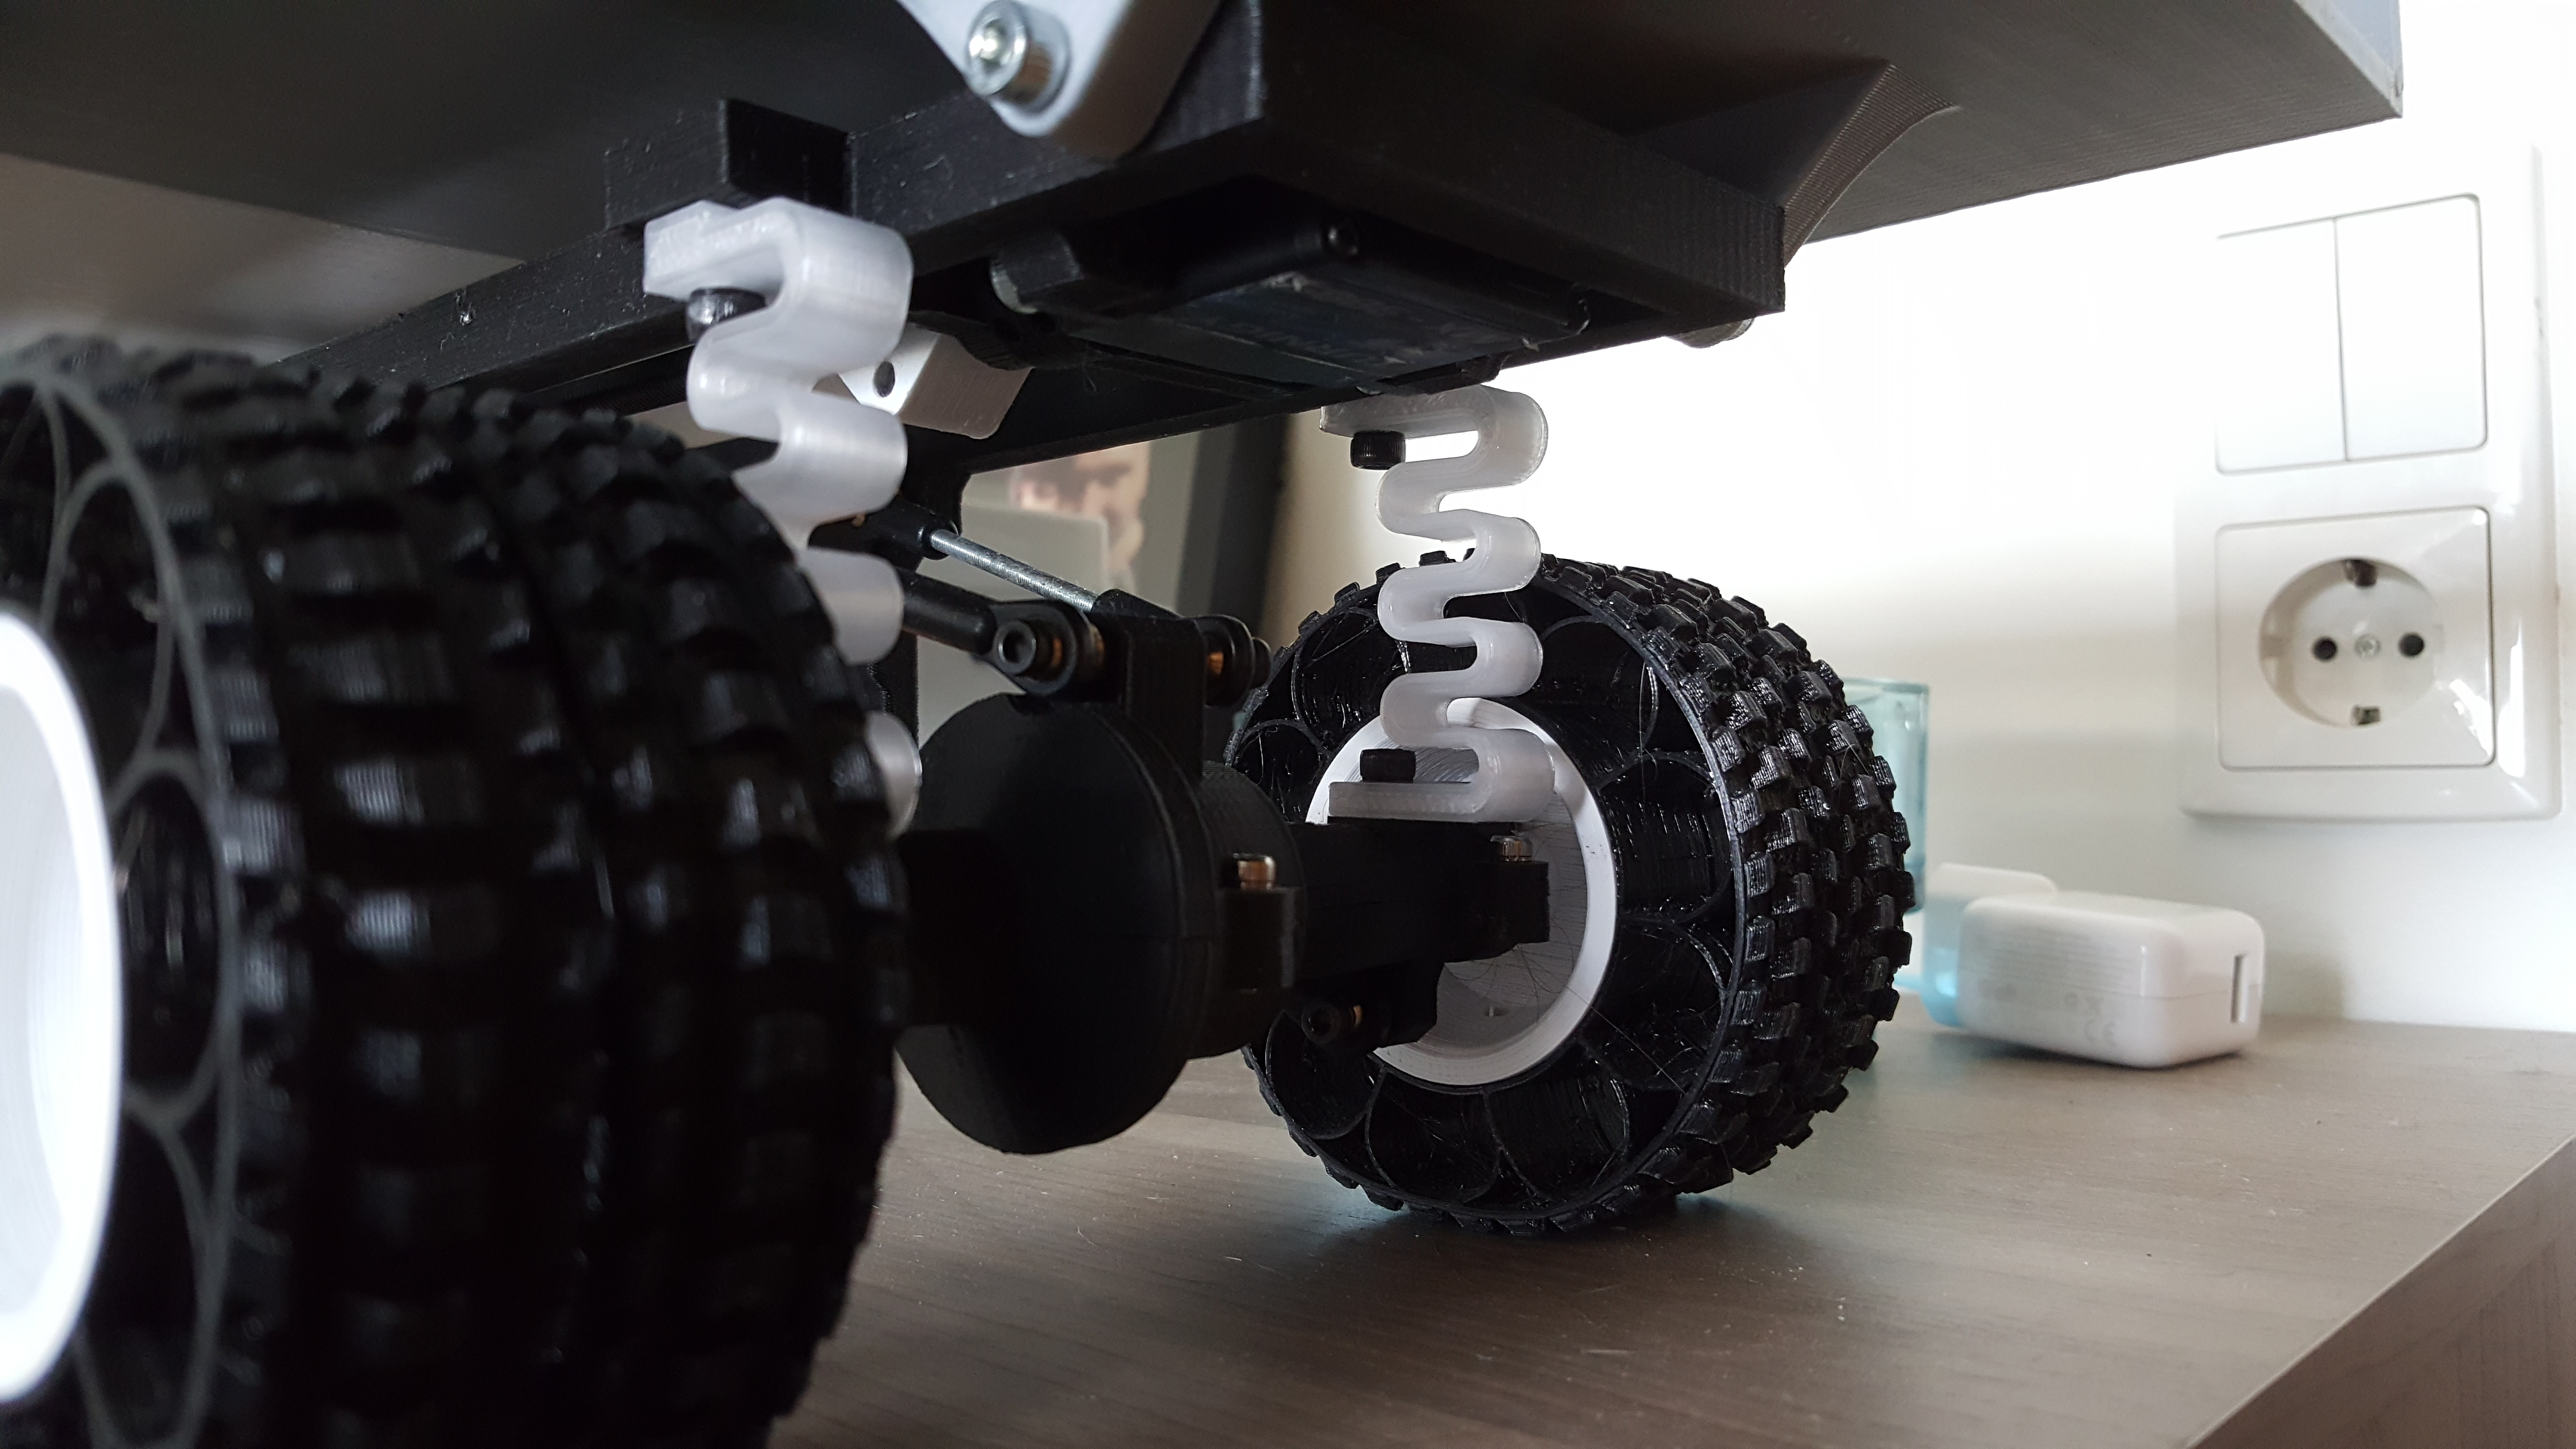 19.jpg Download free STL file Printed truck V2: PLA springs • 3D printer object, MrCrankyface